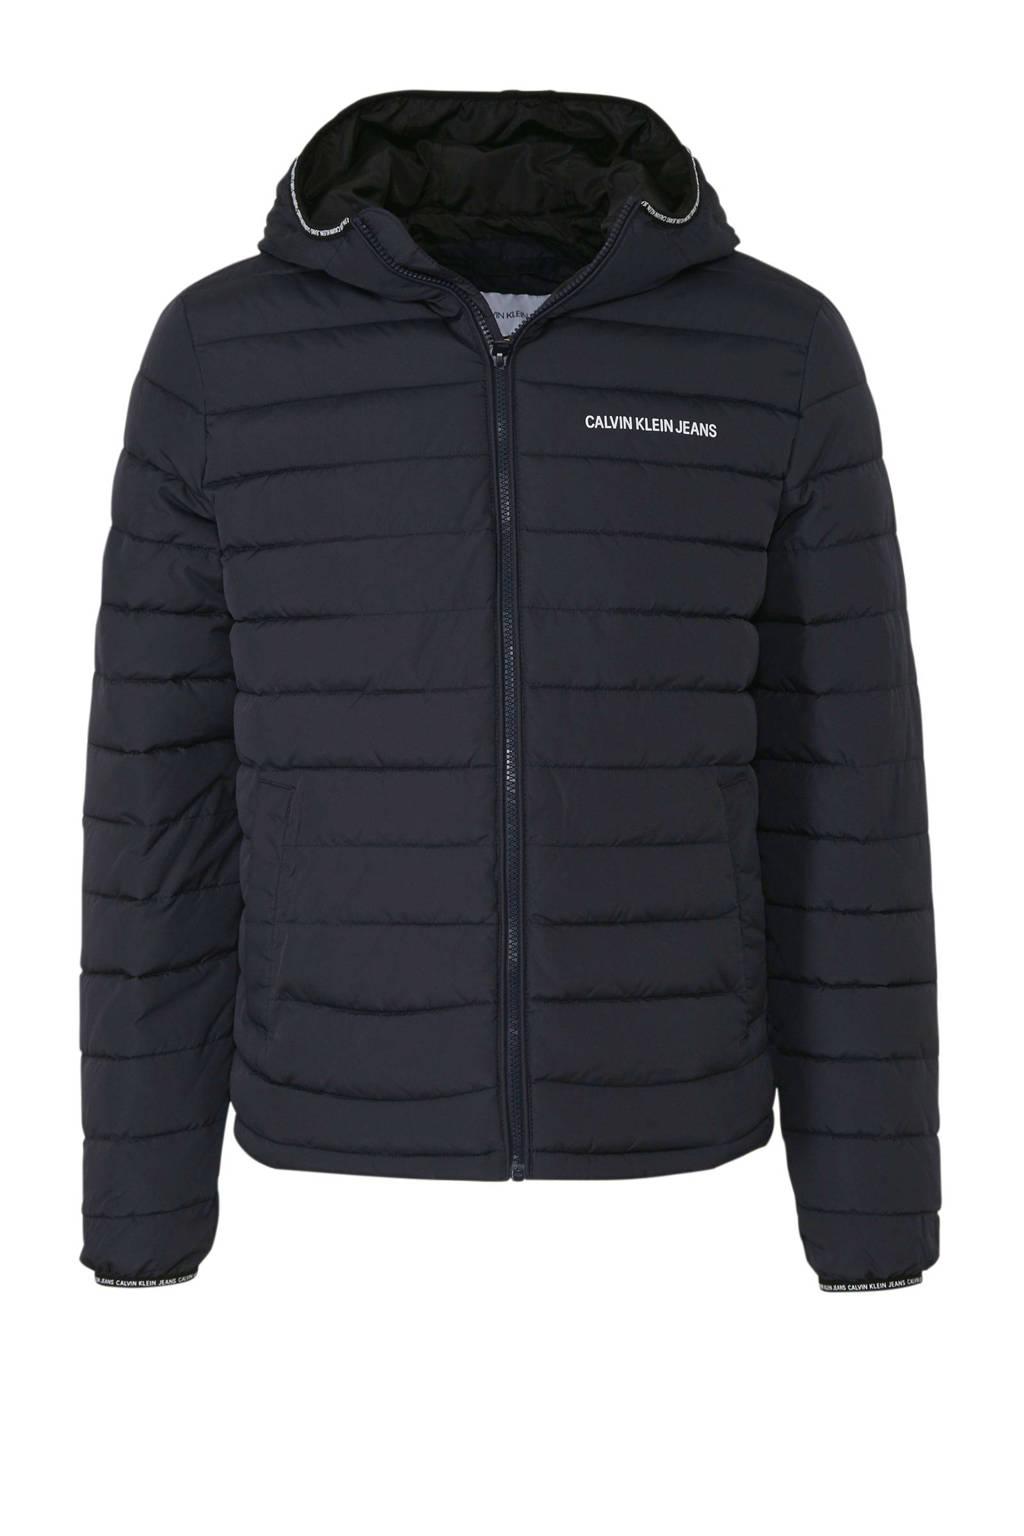 CALVIN KLEIN JEANS jas met capuchon, Donkerblauw